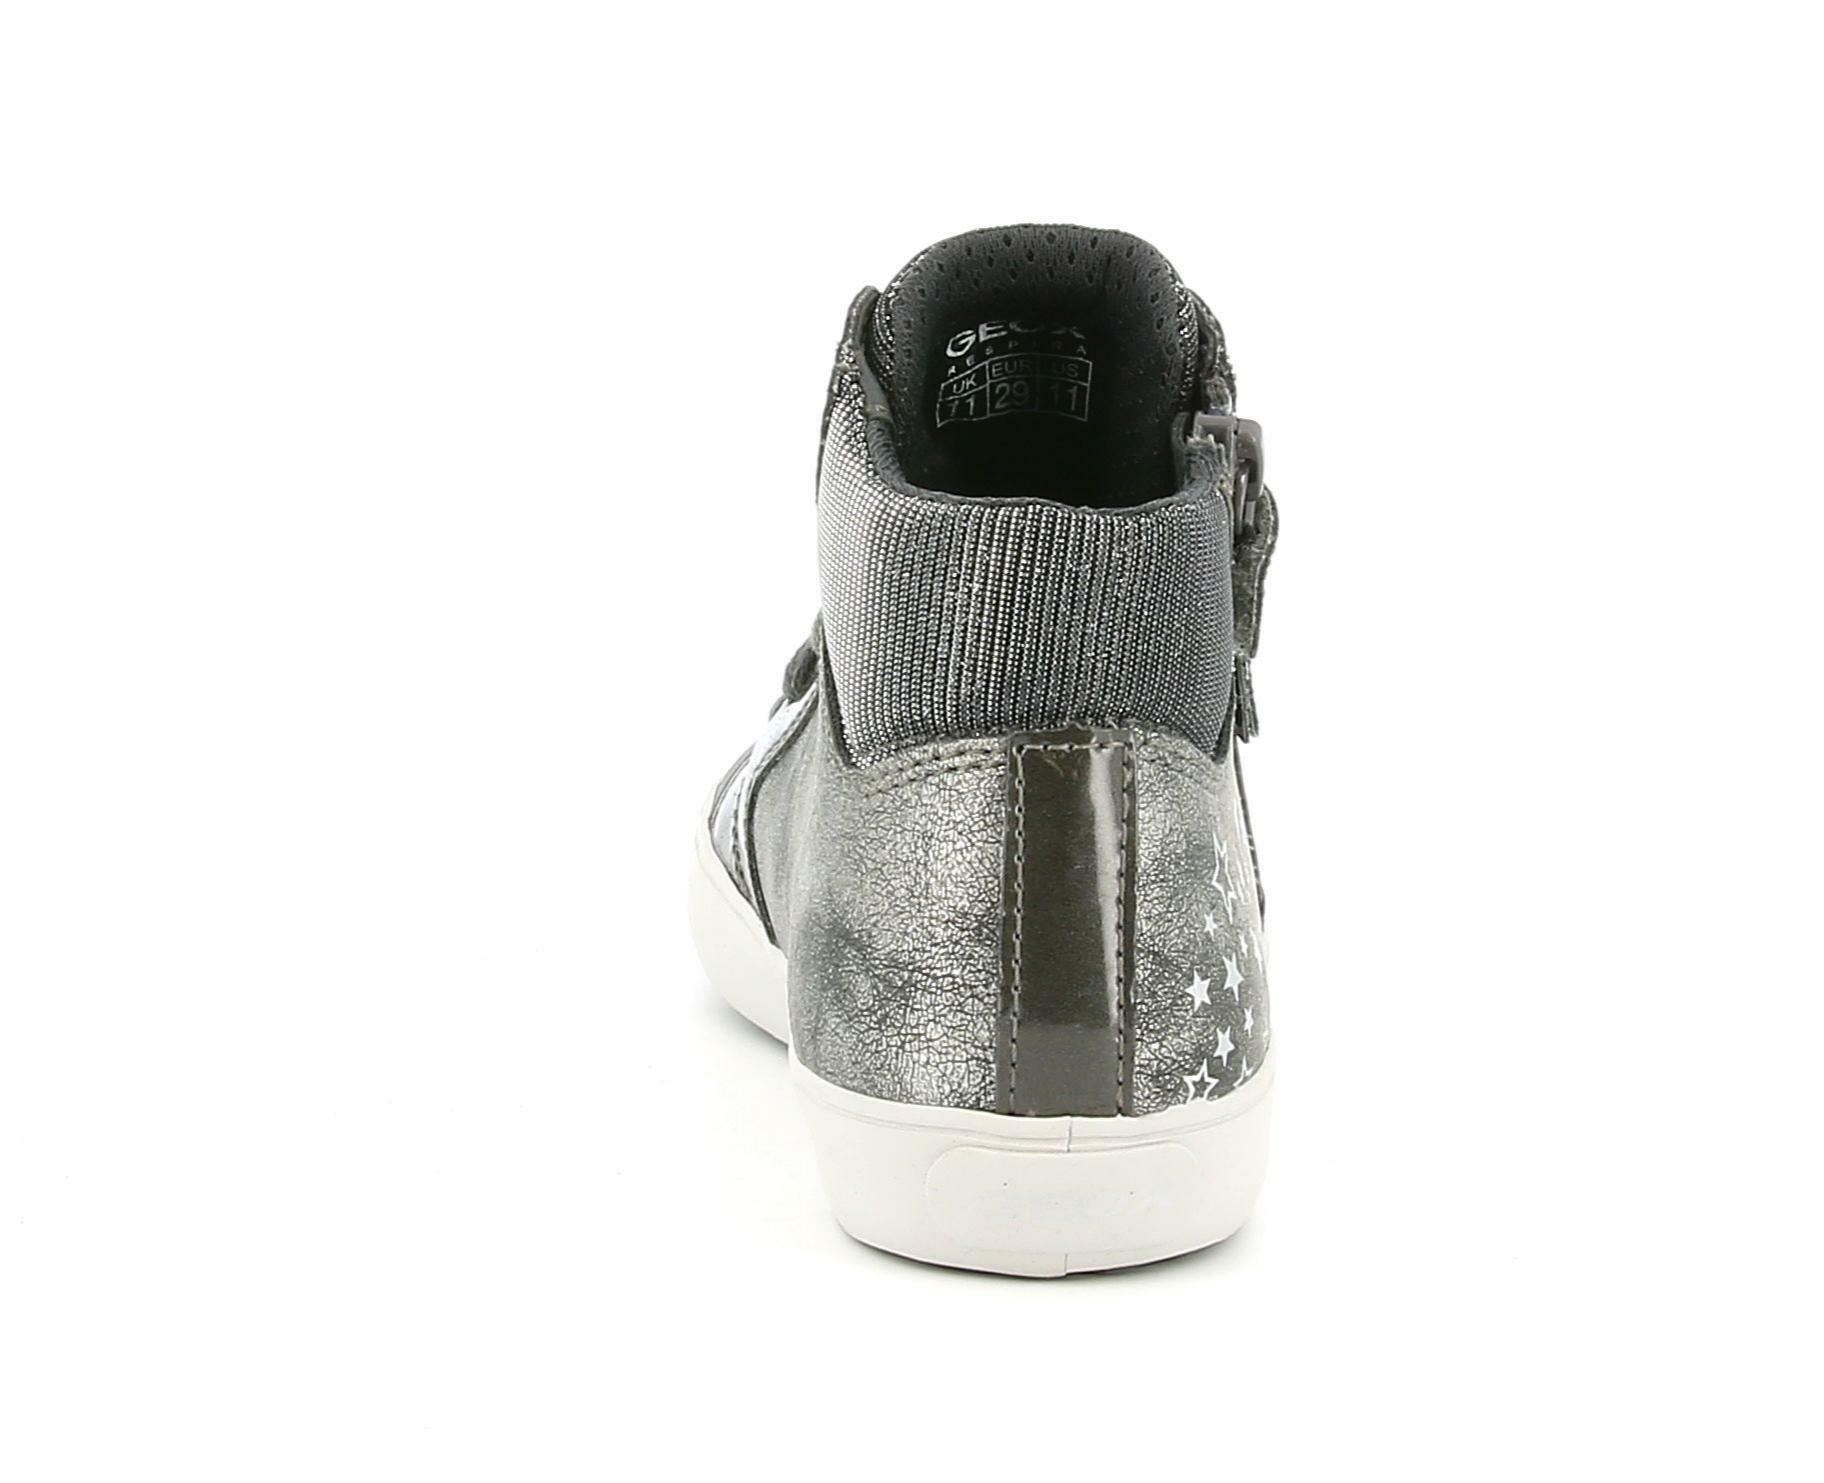 geox geox j gisli g. d j024nd 054pv c9002 grigio calzature sportive bambina